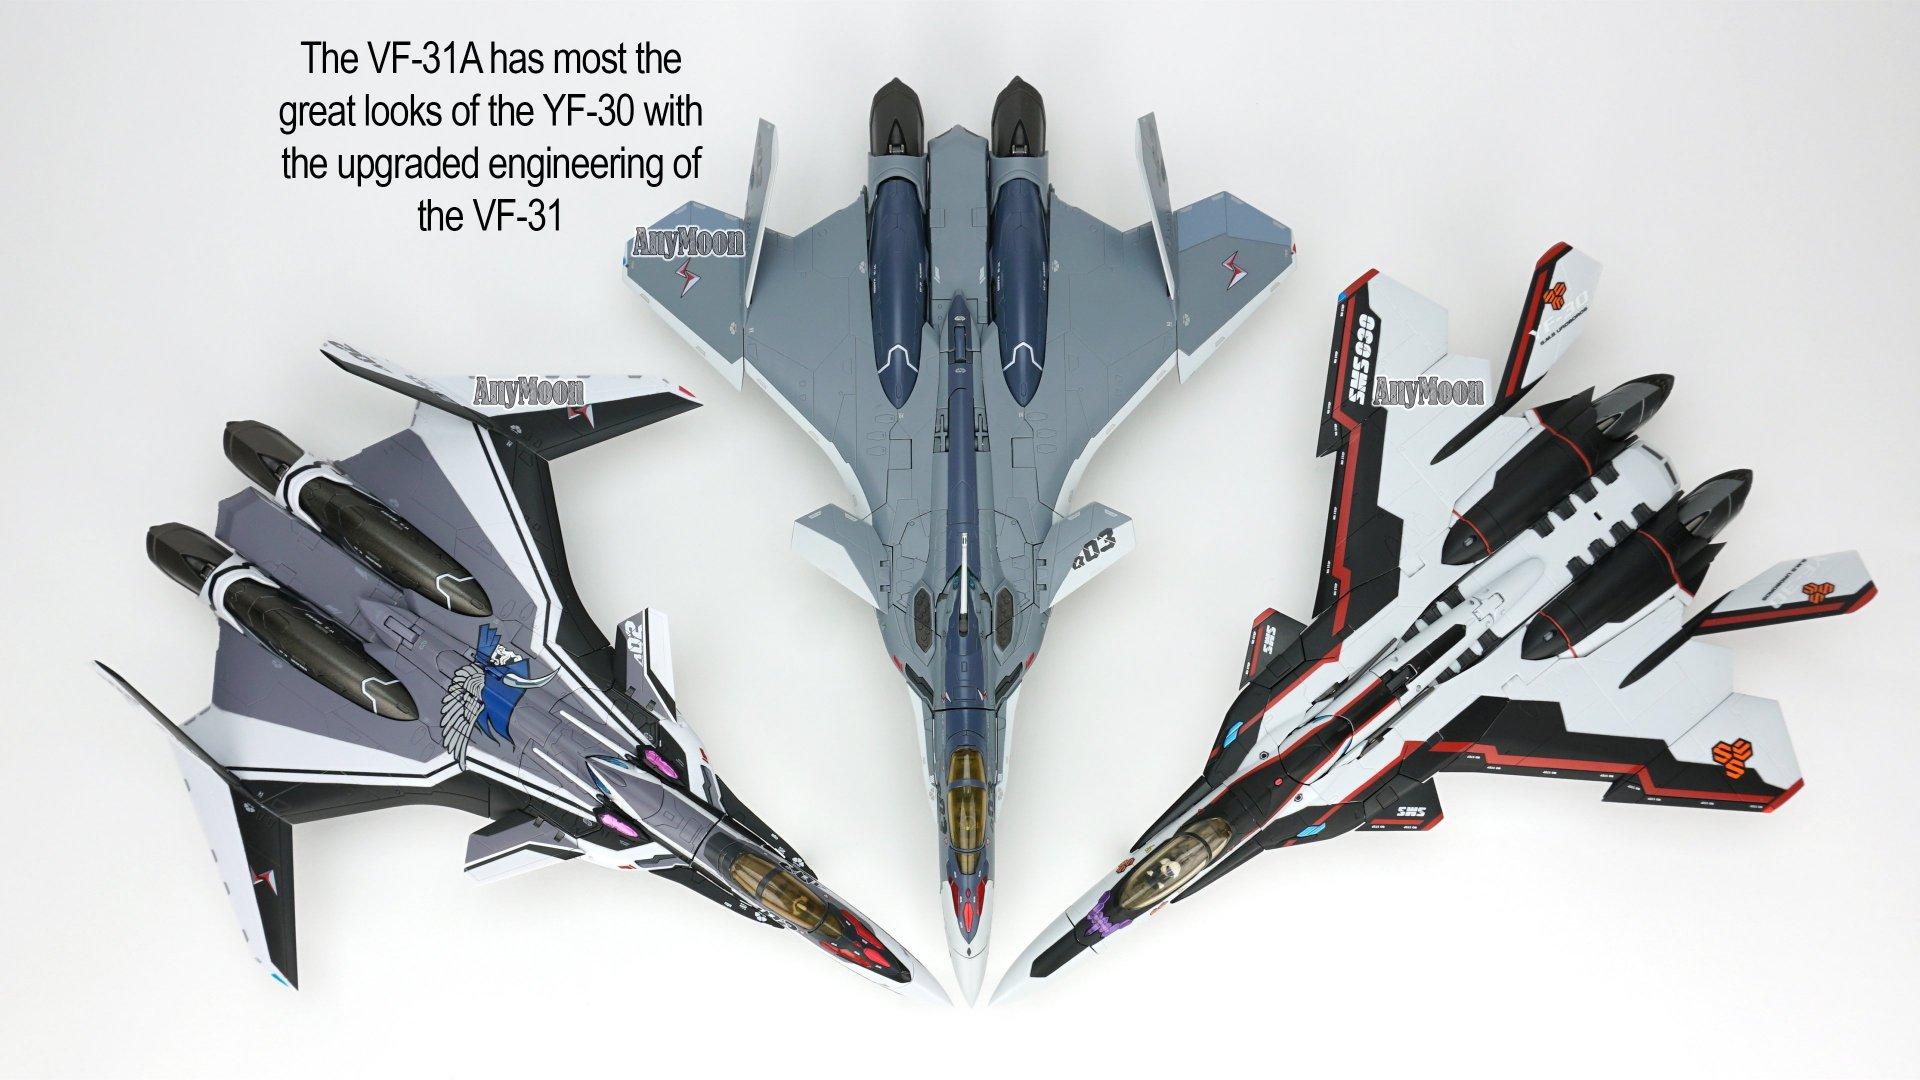 Bandai-DX-VF-31A-7.thumb.jpg.f181e91a20c63ddc365041a0c153cd70.jpg